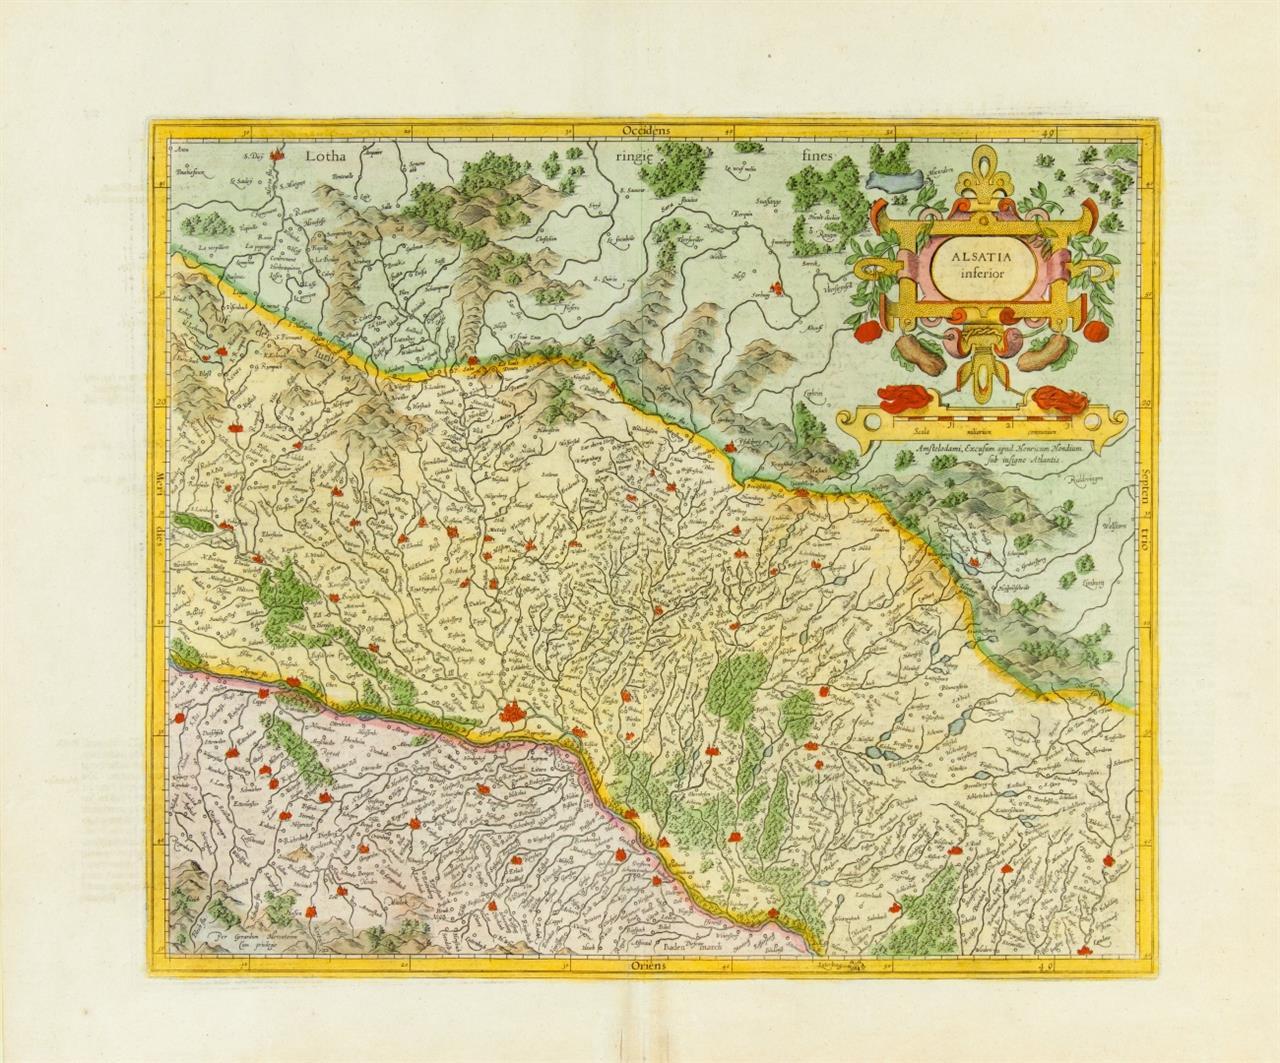 Elsass. Alsatia inferior. Kolorierte Kupferstichkarte bei H. Hondius.